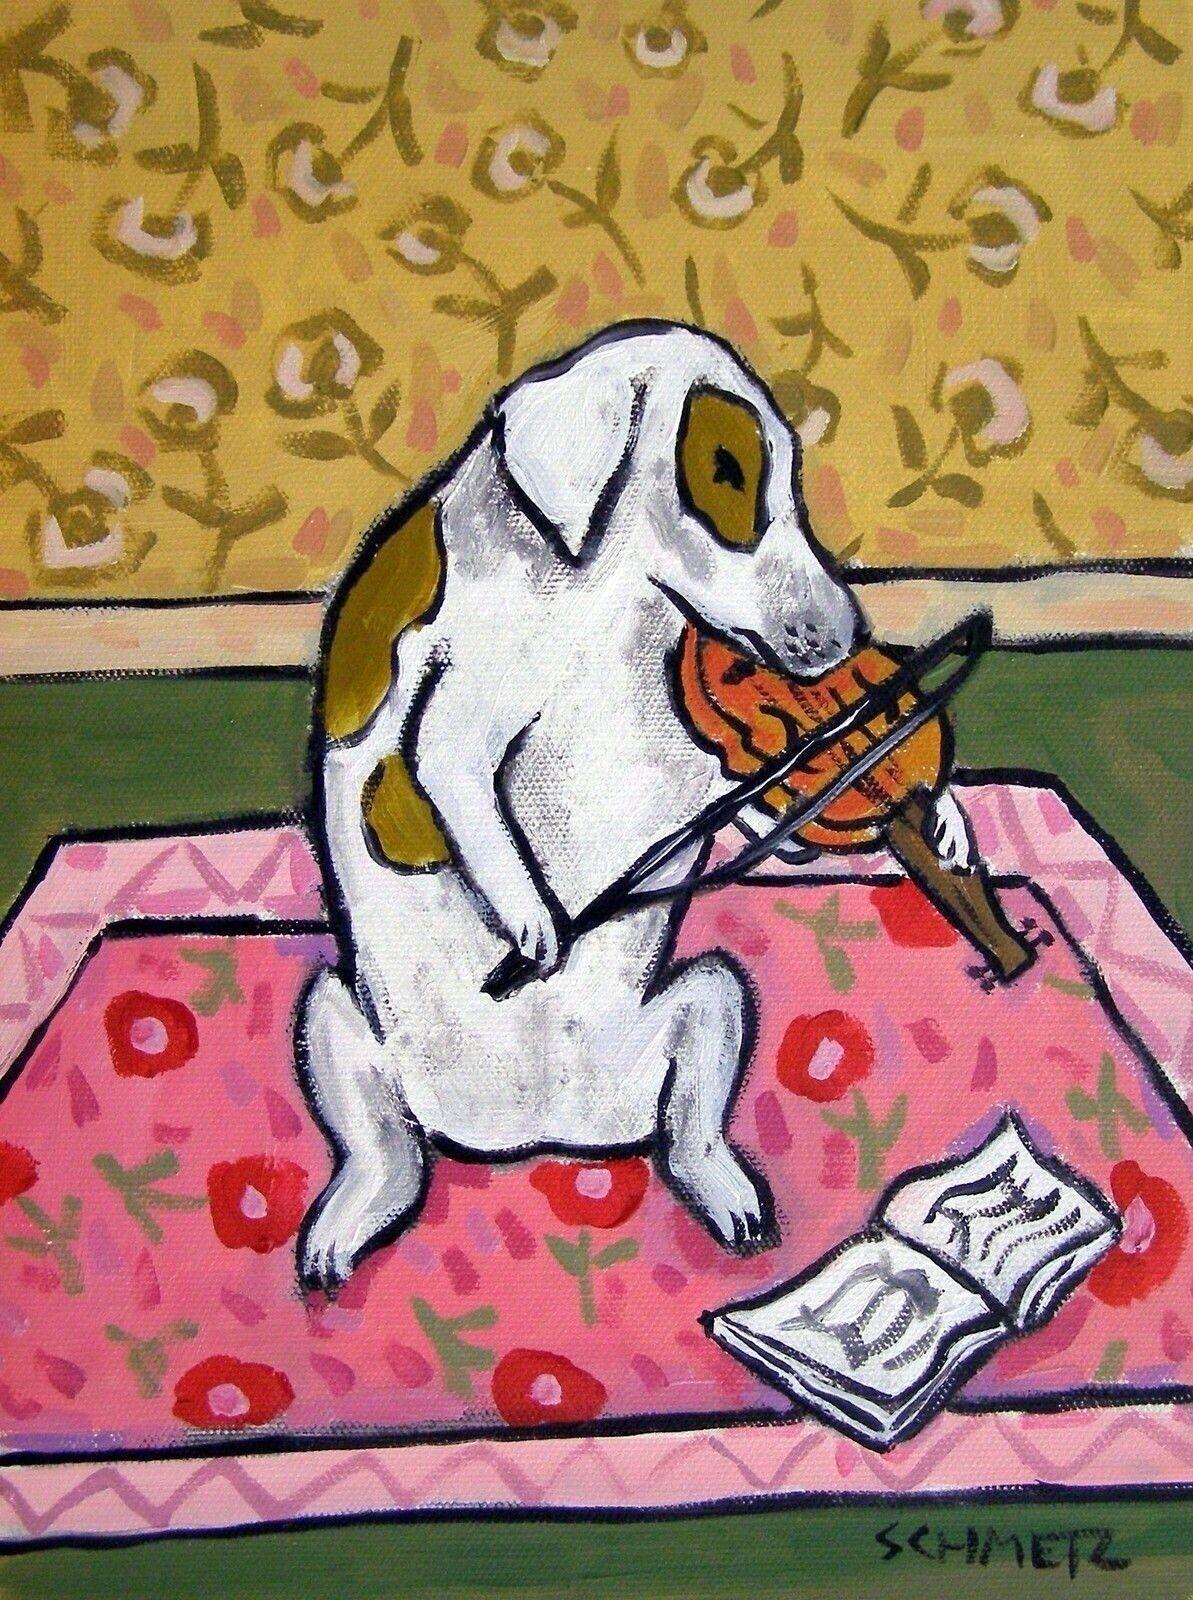 BullDog art PRINT abstract folk violin painting JSCHMETZ 8x10 dog poster giclee